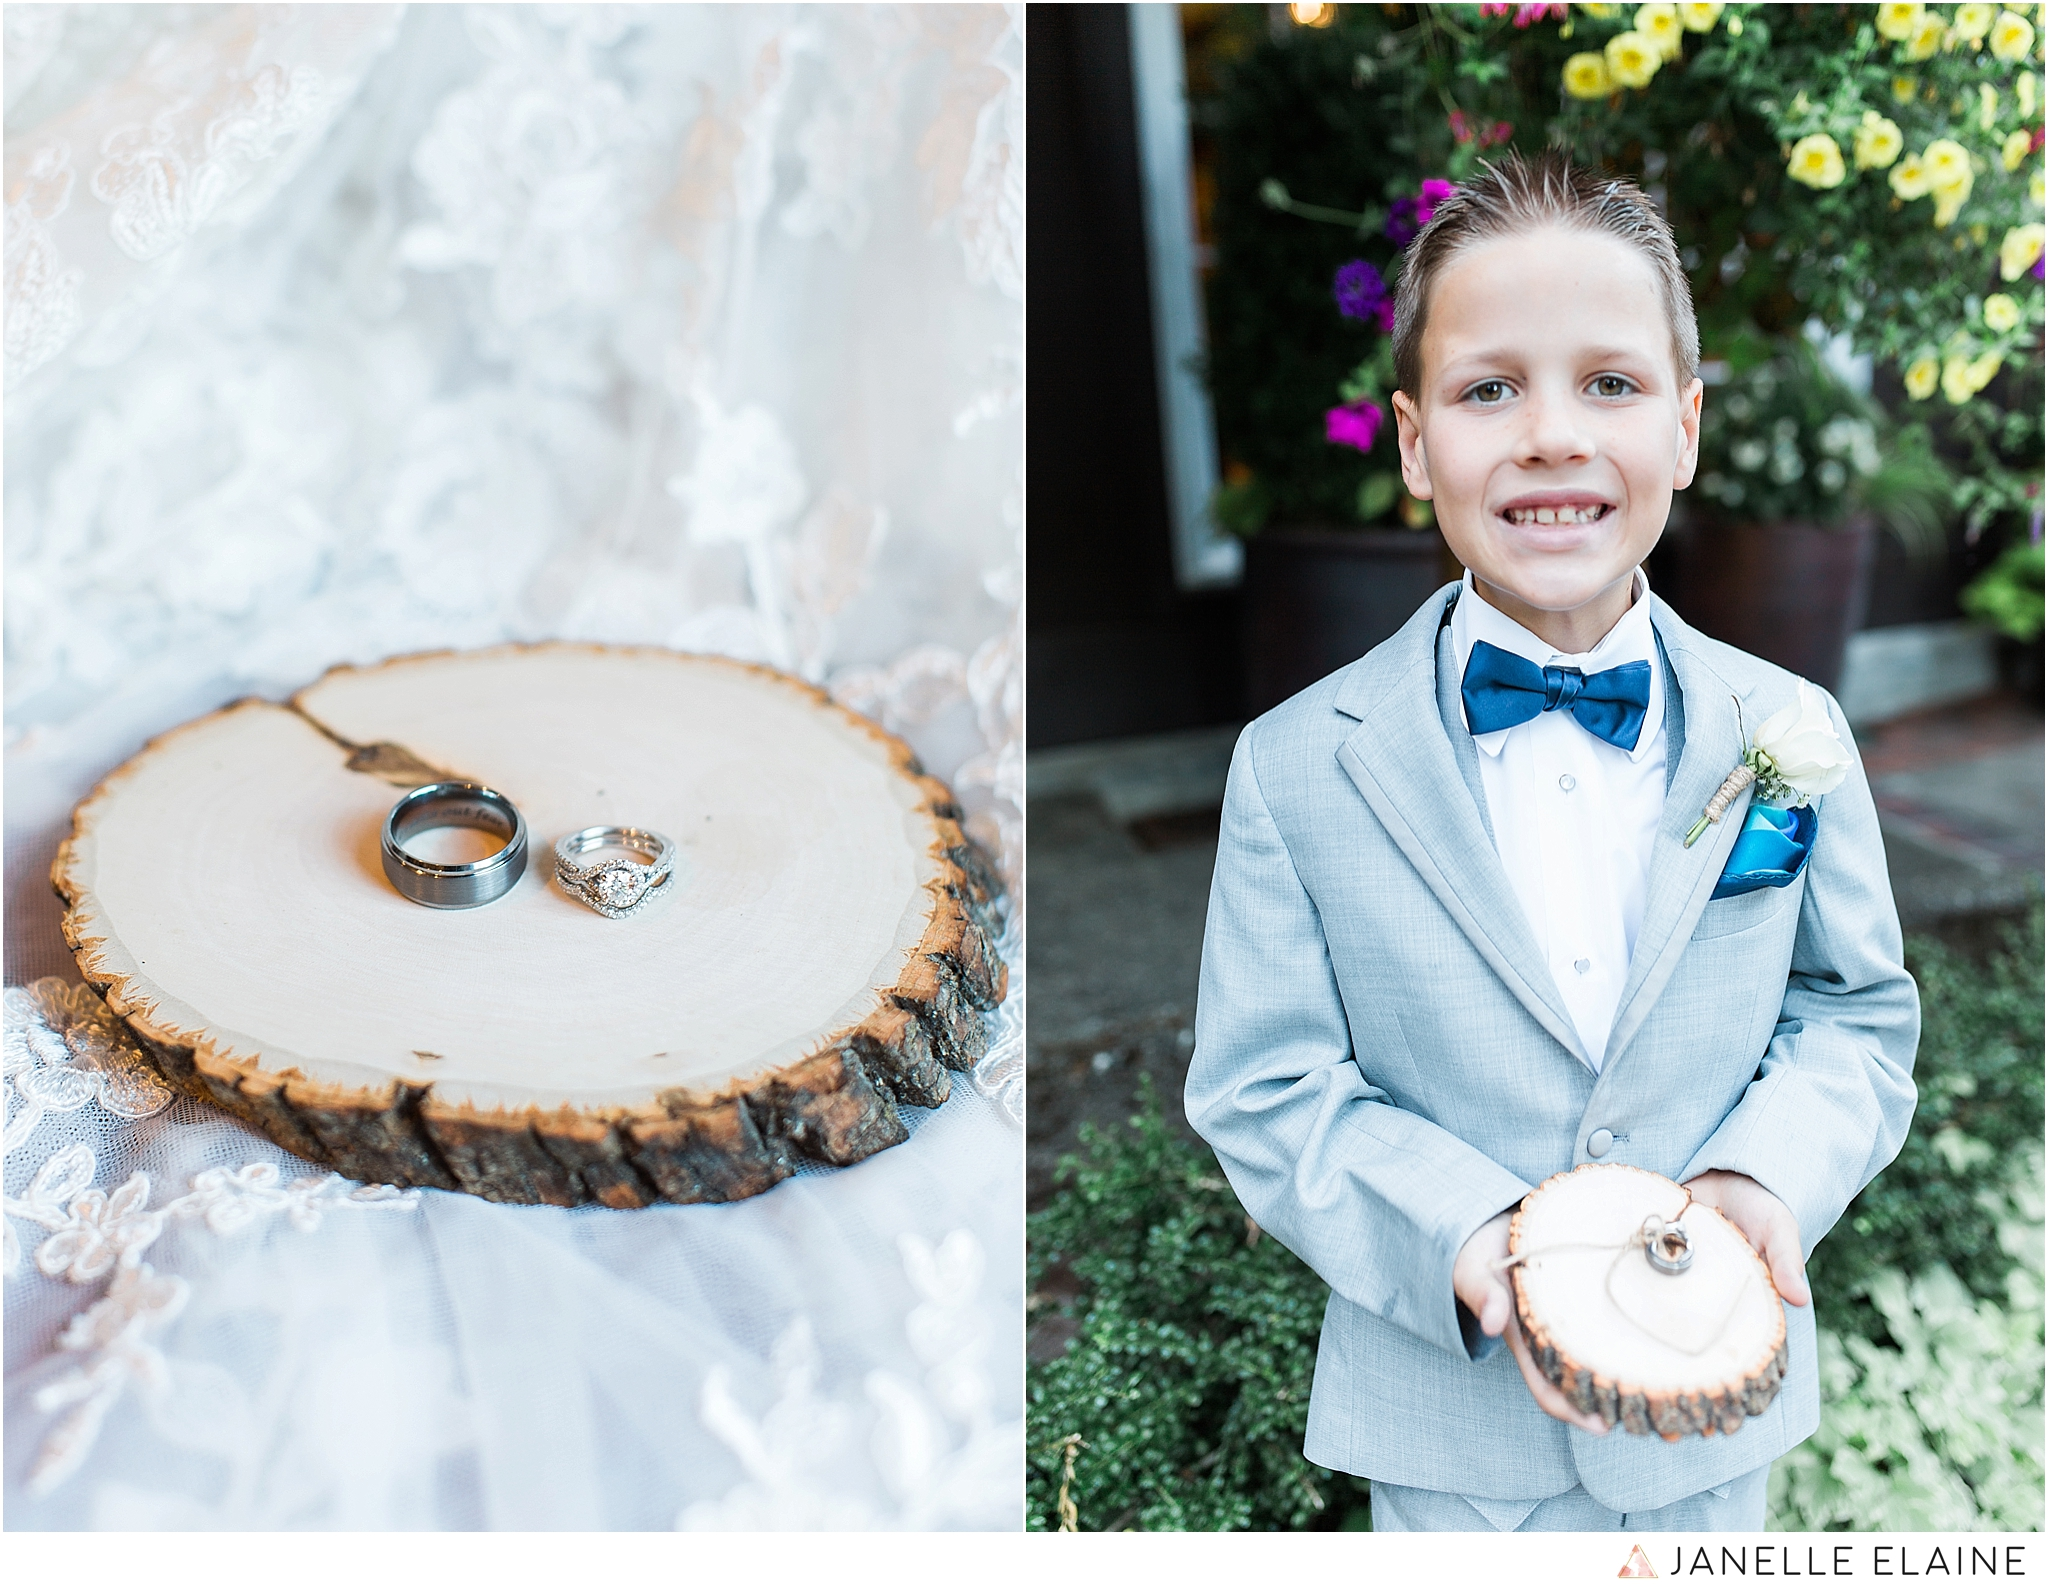 janelle elaine photography-professional wedding photographer-seattle-bellevue-robinswood house-95.jpg